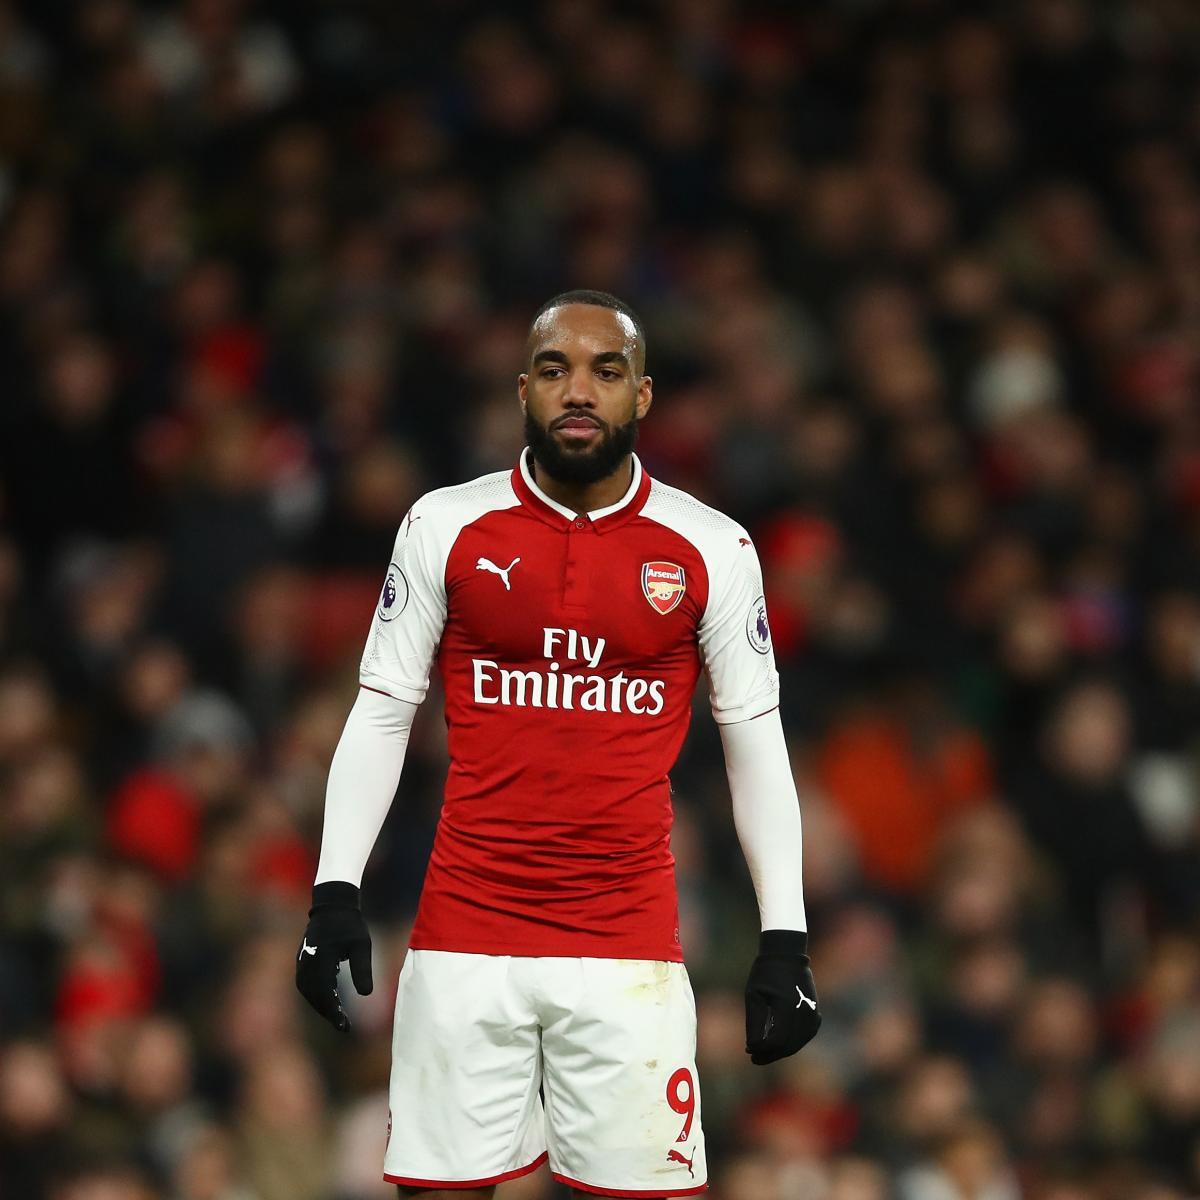 AFC Bournemouth vs. Arsenal: Team News, Preview, Live Stream, TV Info